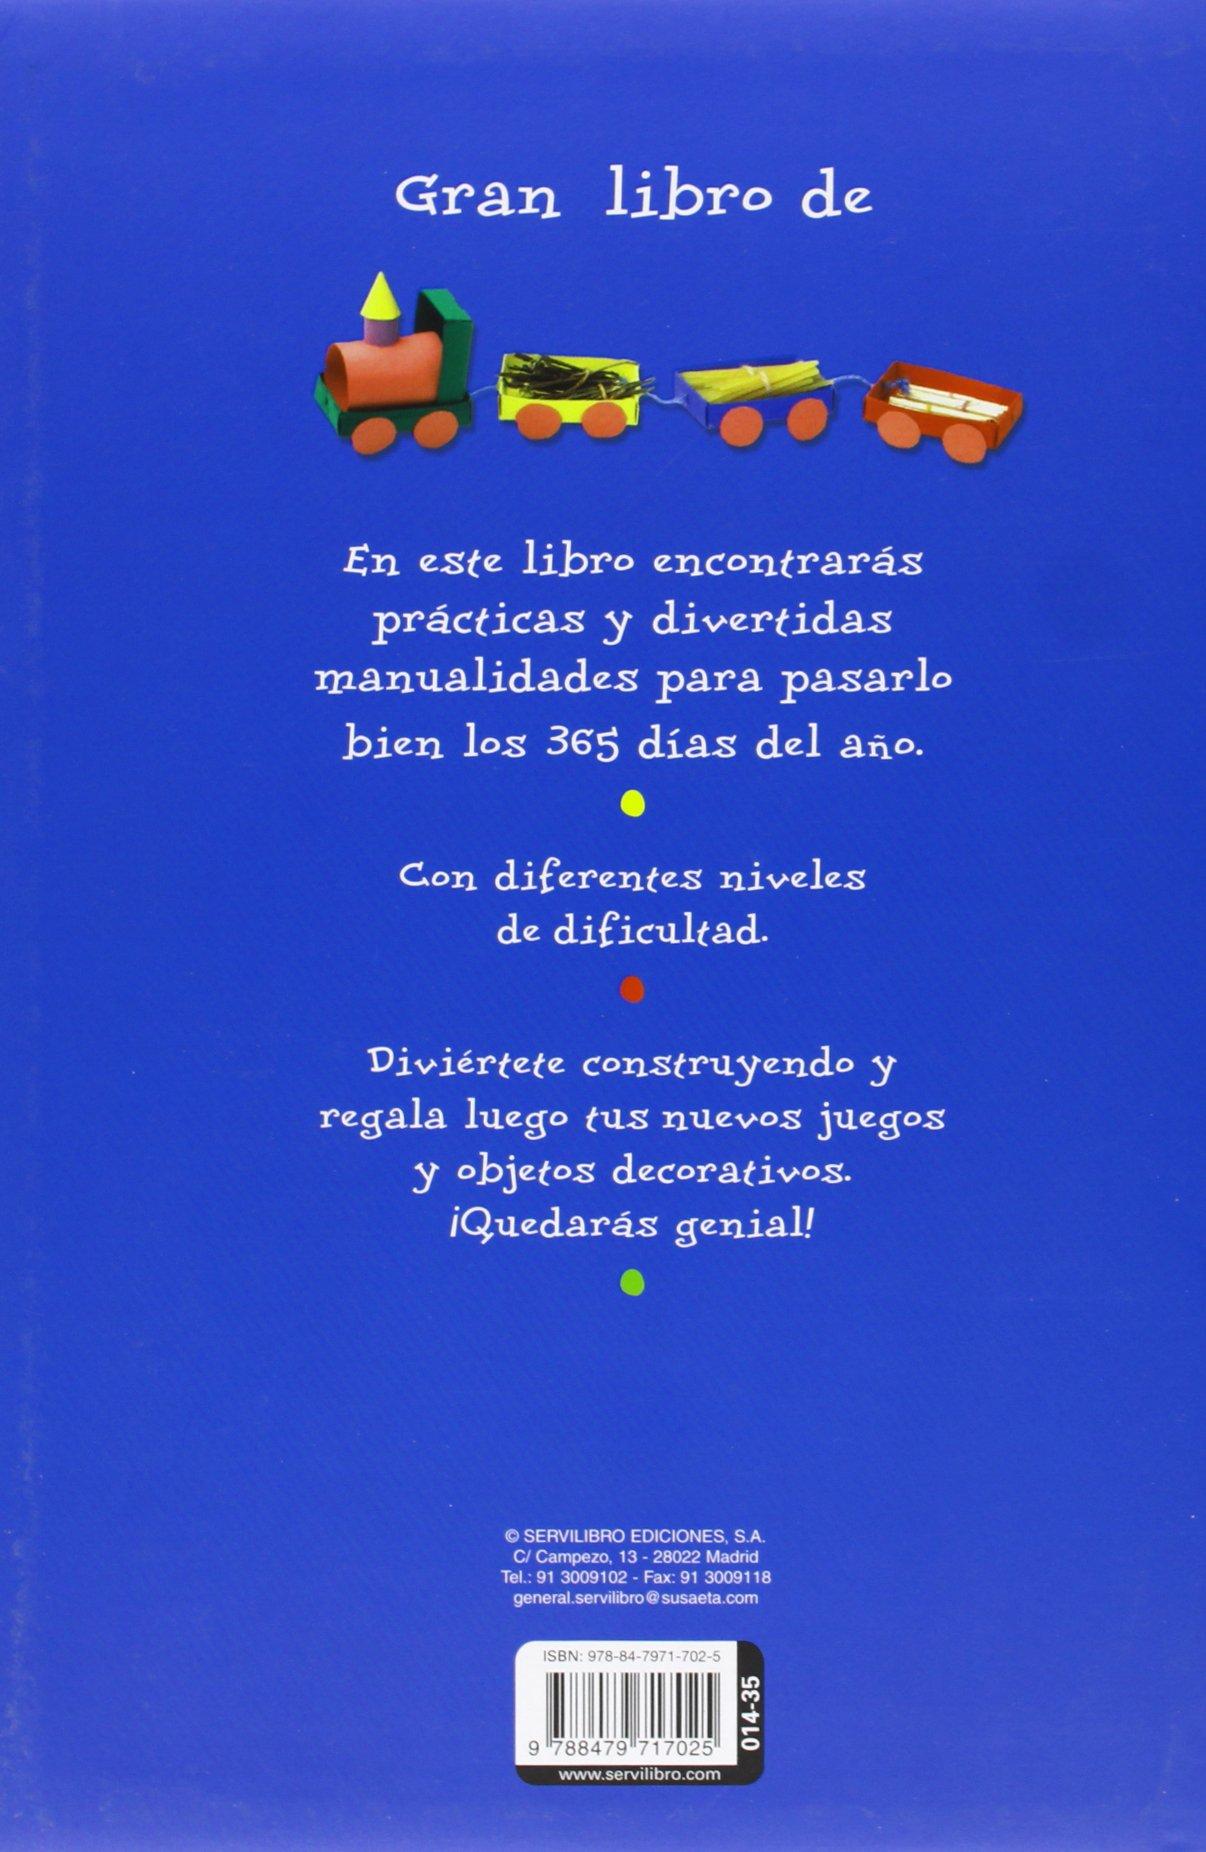 Manualidades para 365 Días (Gran libro de): Amazon.es: Servilibro ...